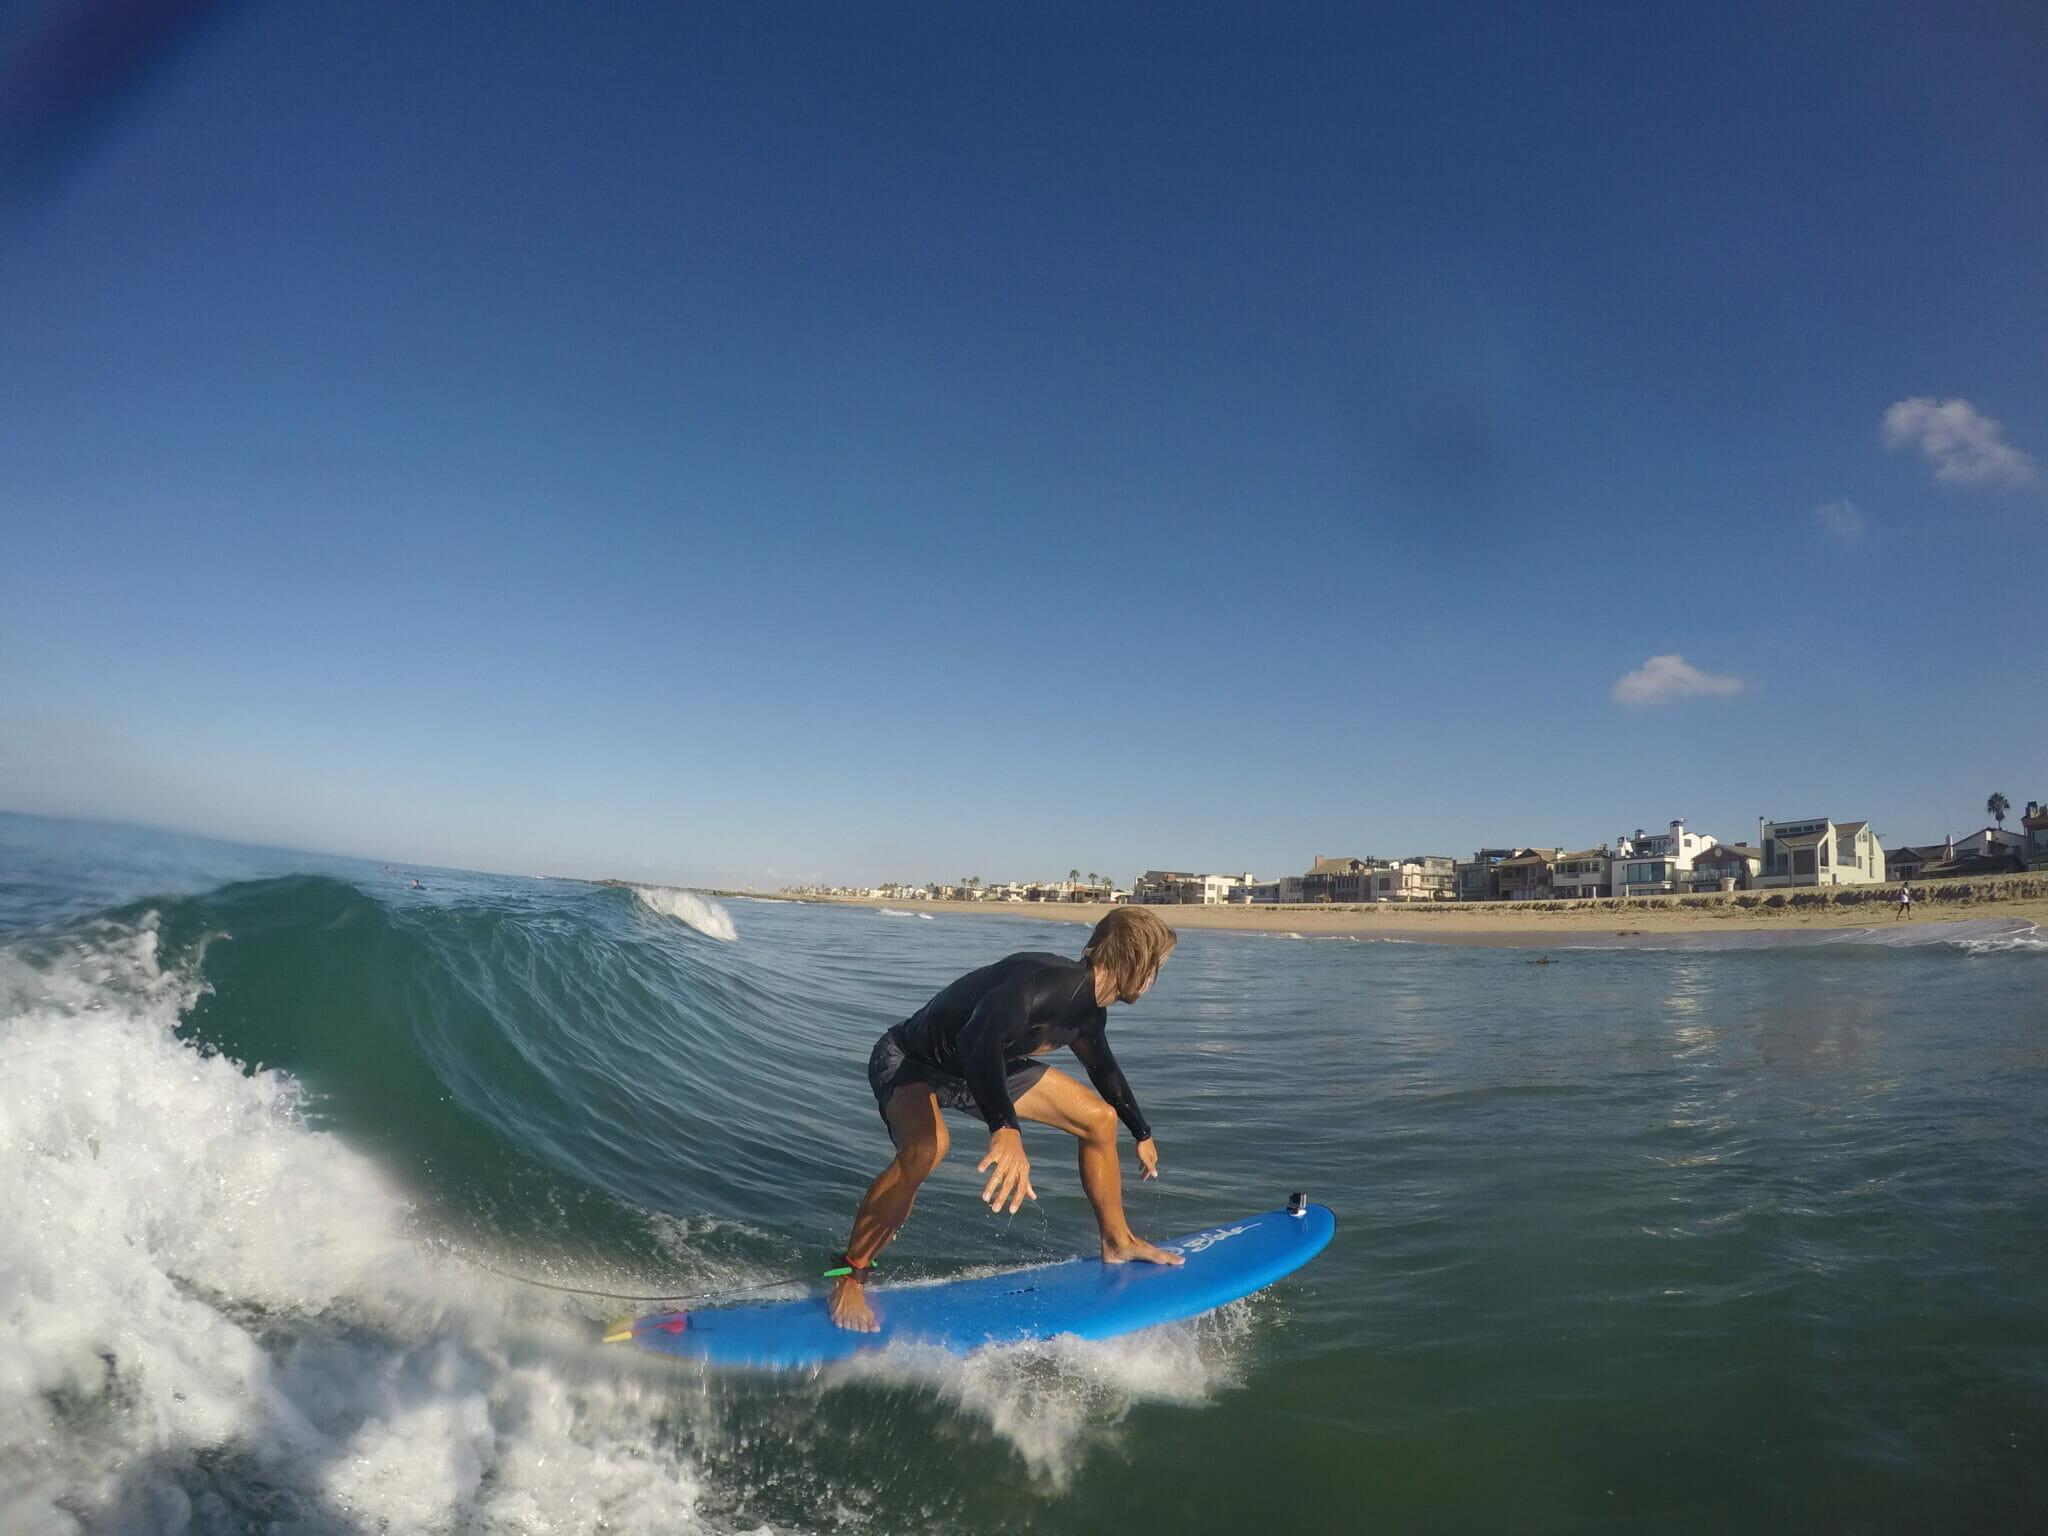 Surf lesson in Newport Beach.